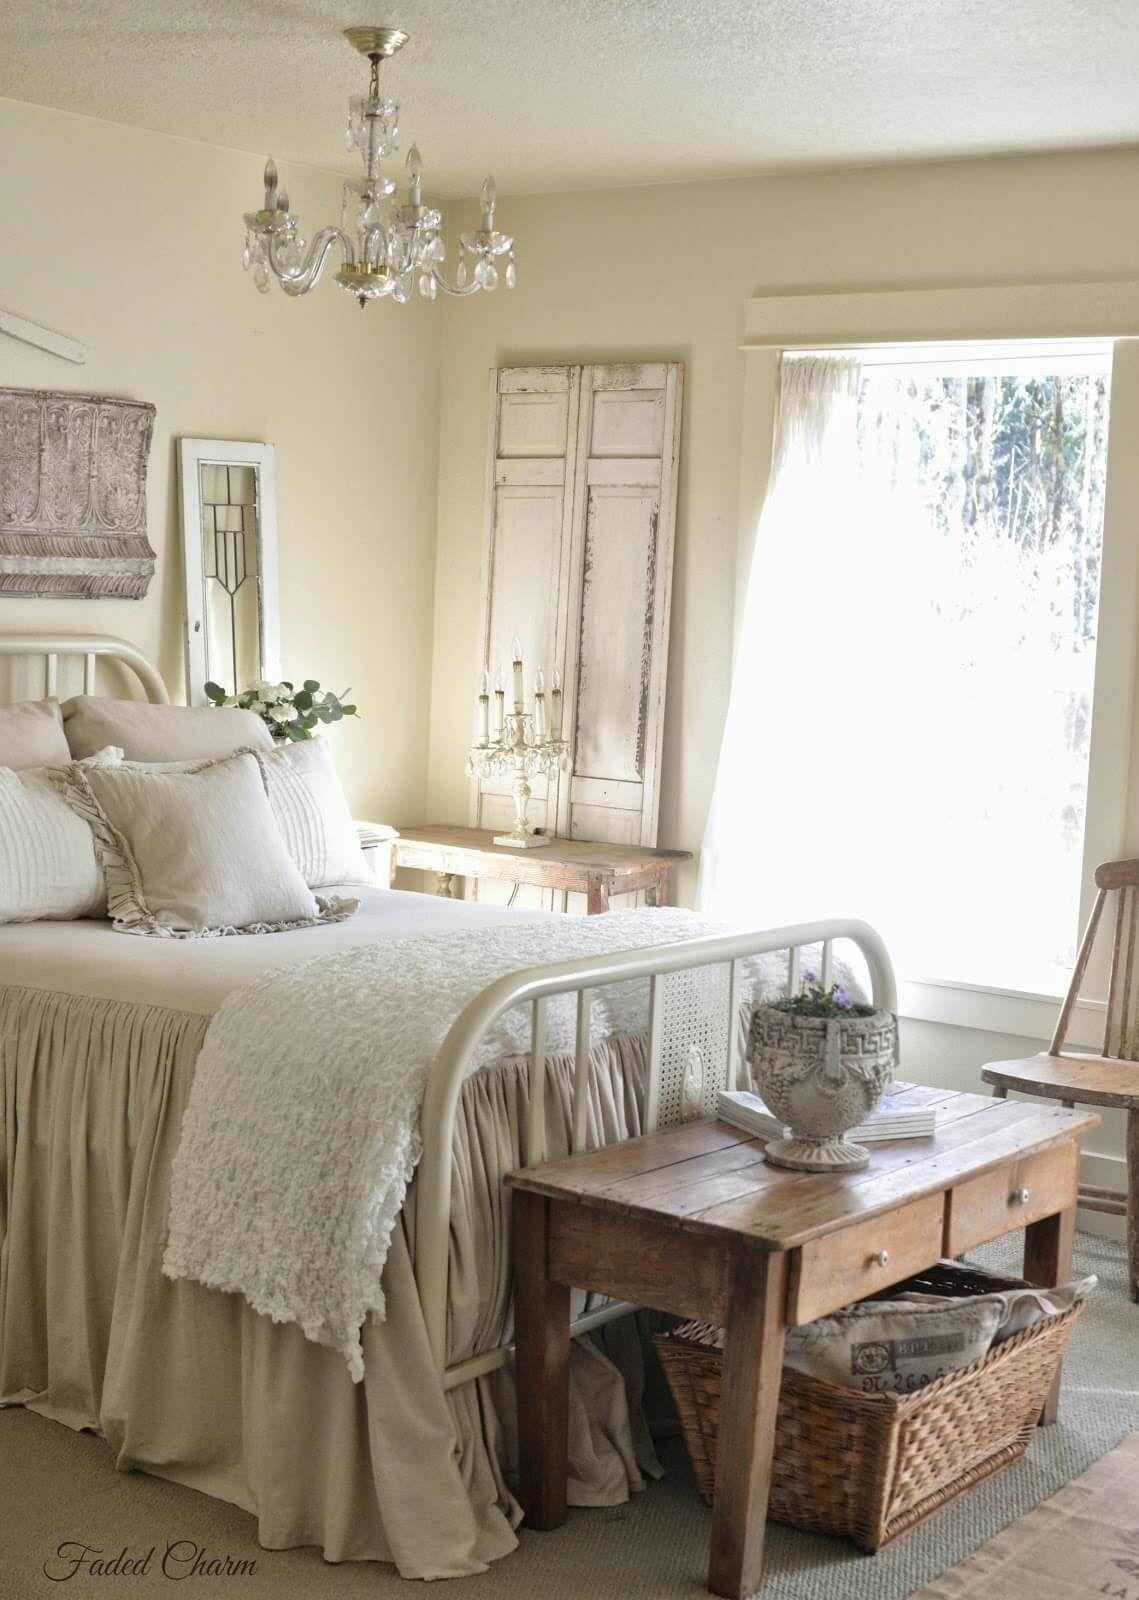 39 rustic farmhouse bedroom design and decor ideas to transform